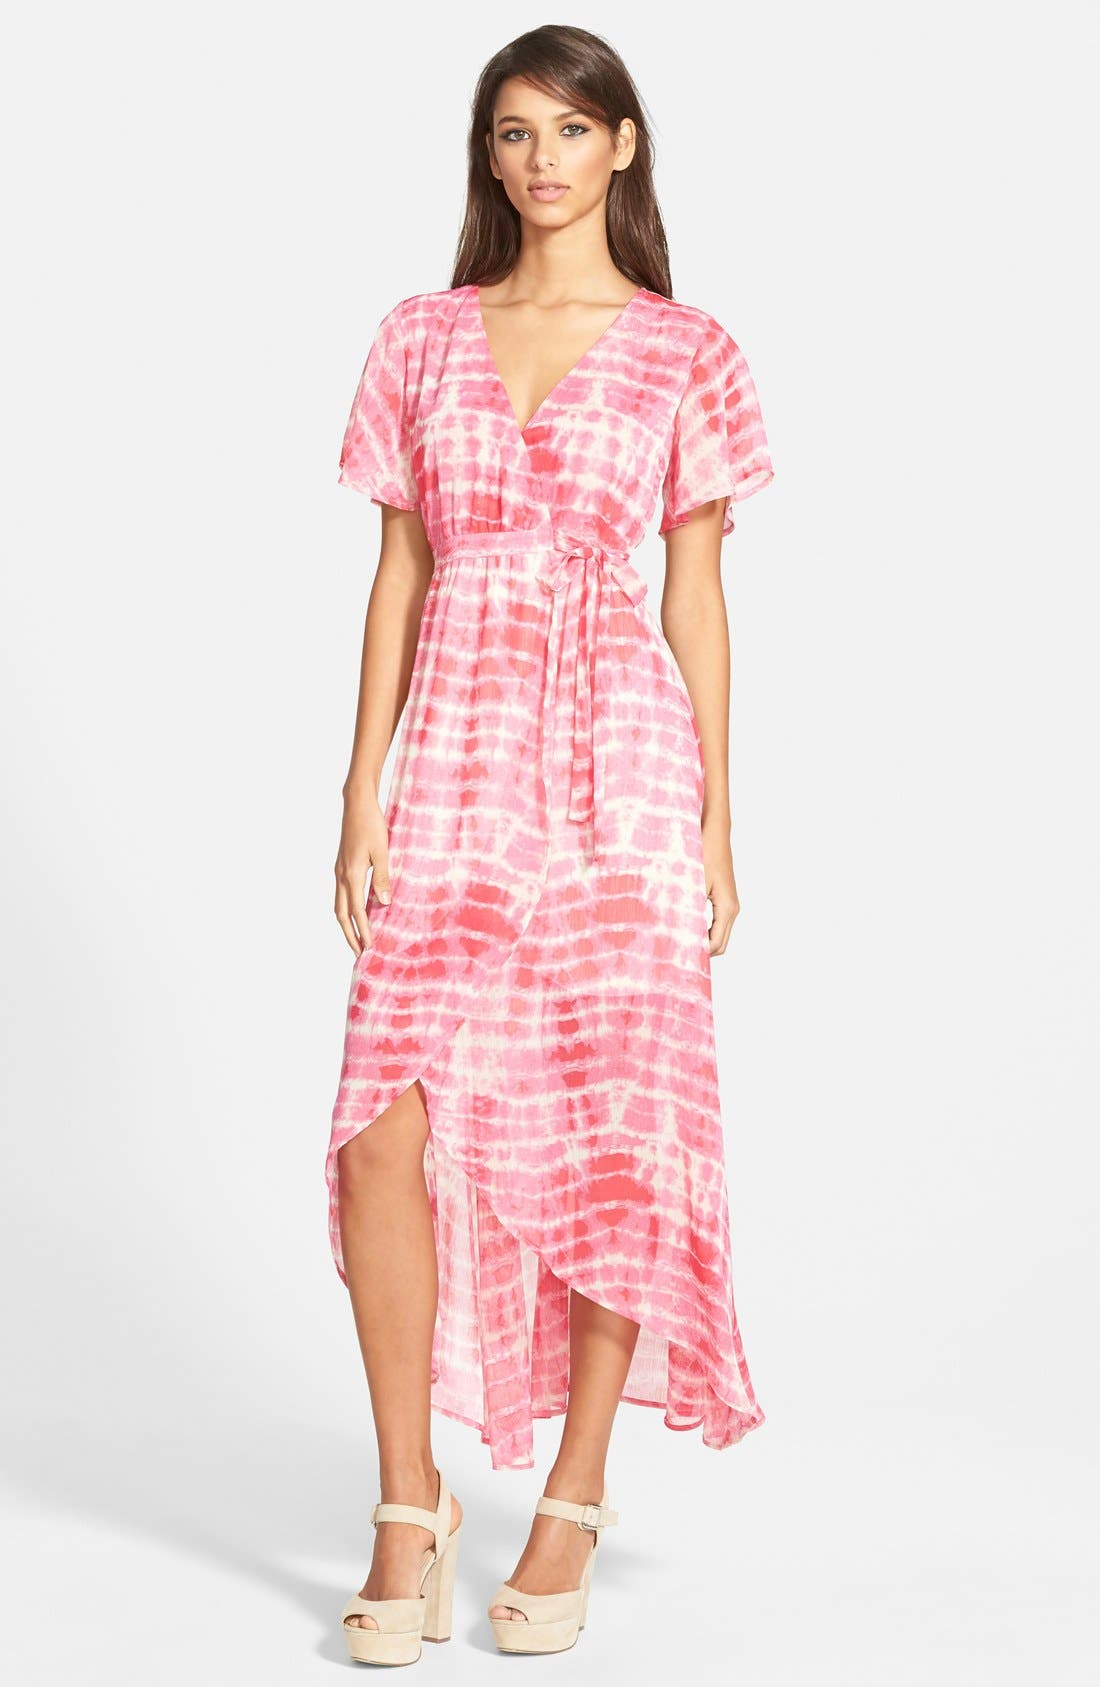 Alternate Image 1 Selected - June & Hudson Floral Print High/Low Wrap Dress